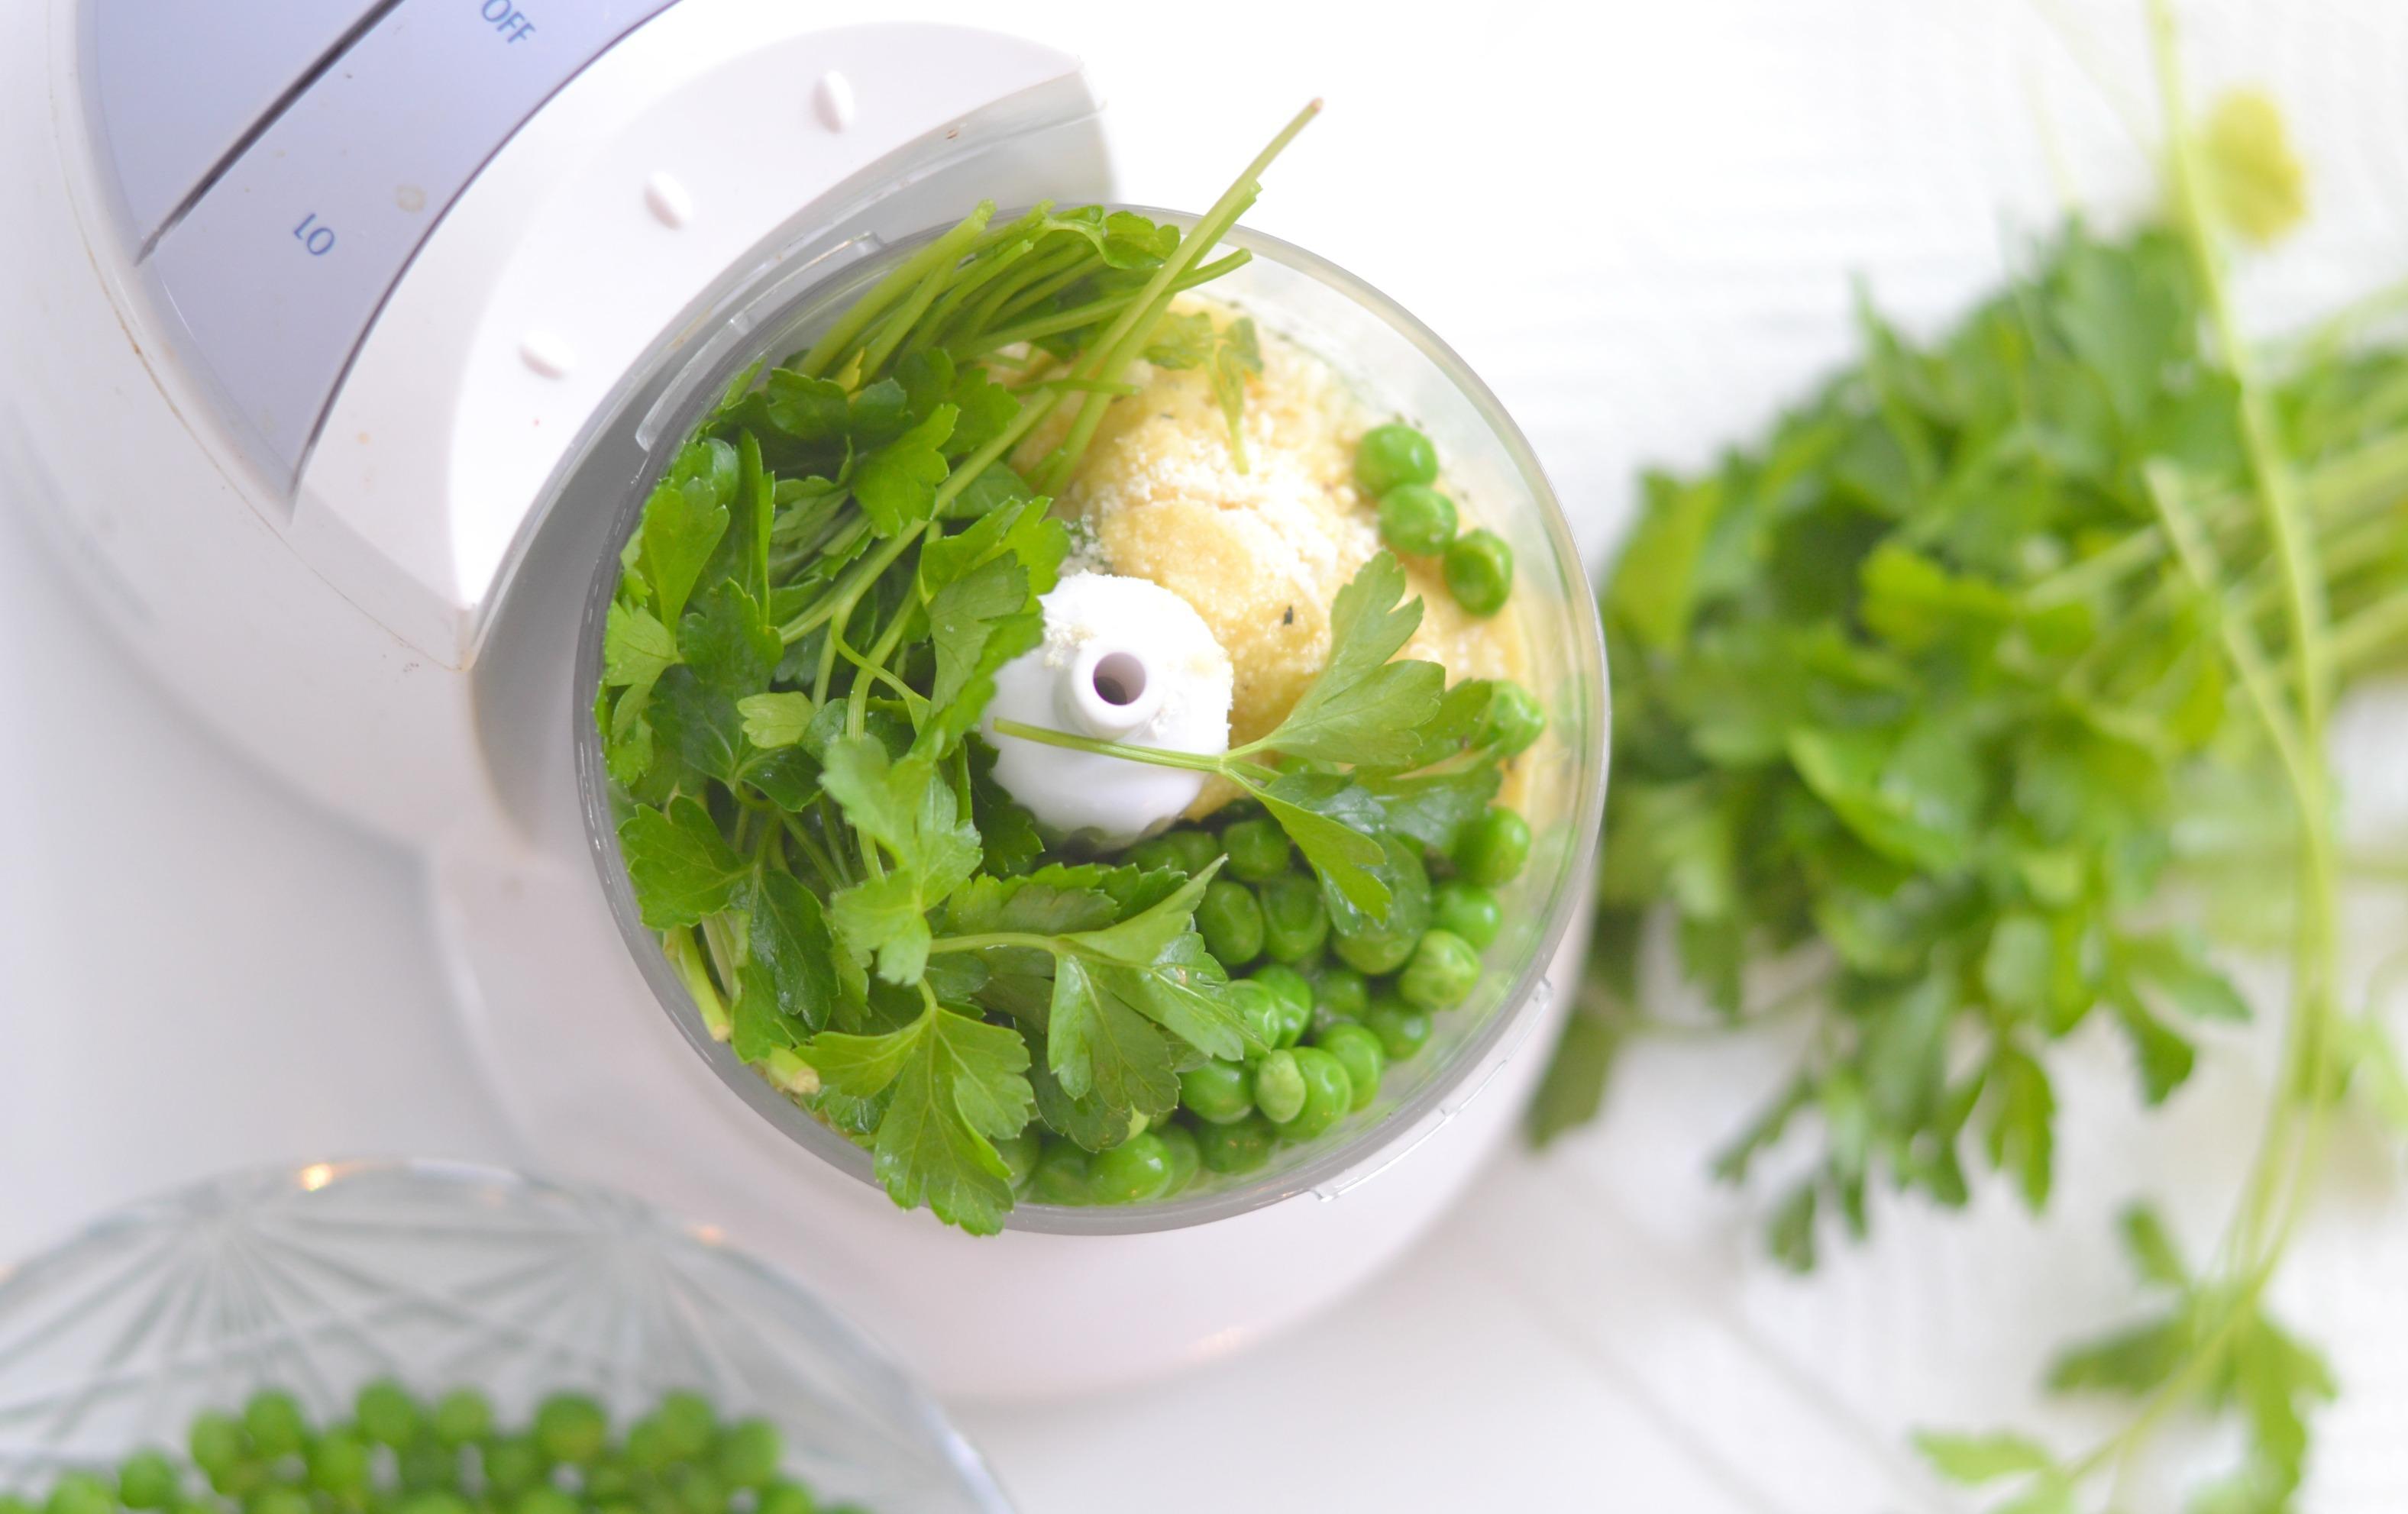 pea pesto, make your own pesto, pesto recipes, basil pesto recipes, easy pea pesto, 5 minute pea pesto, recipes using peas, pea pesto pasta, veggie recipes